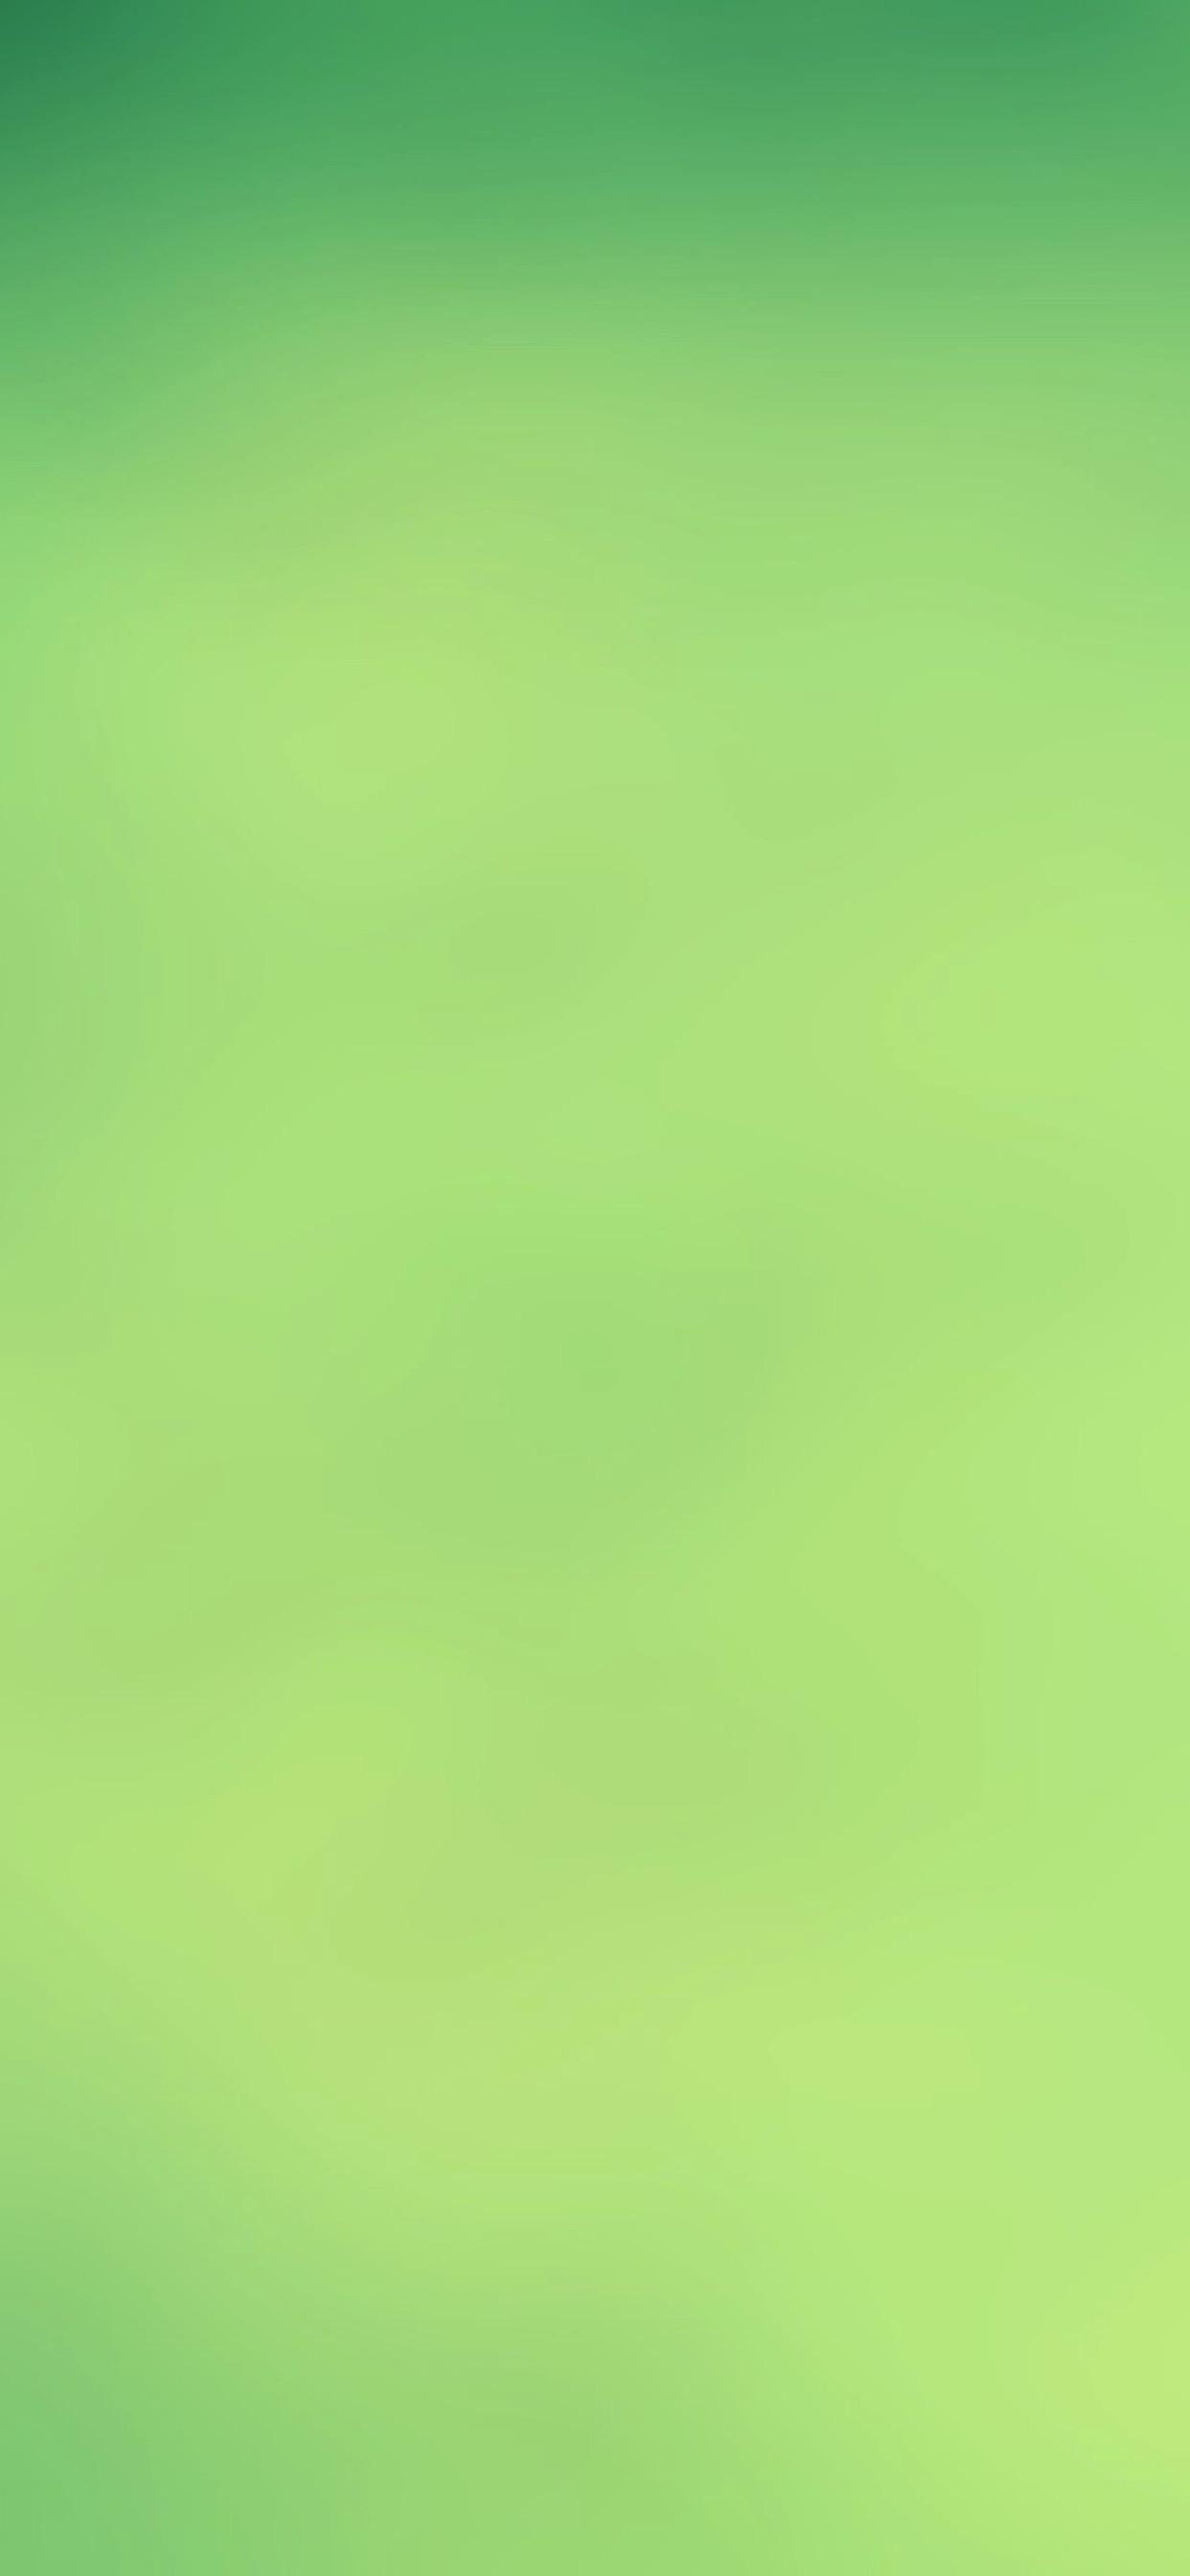 iPhone XS Max 壁紙 0252